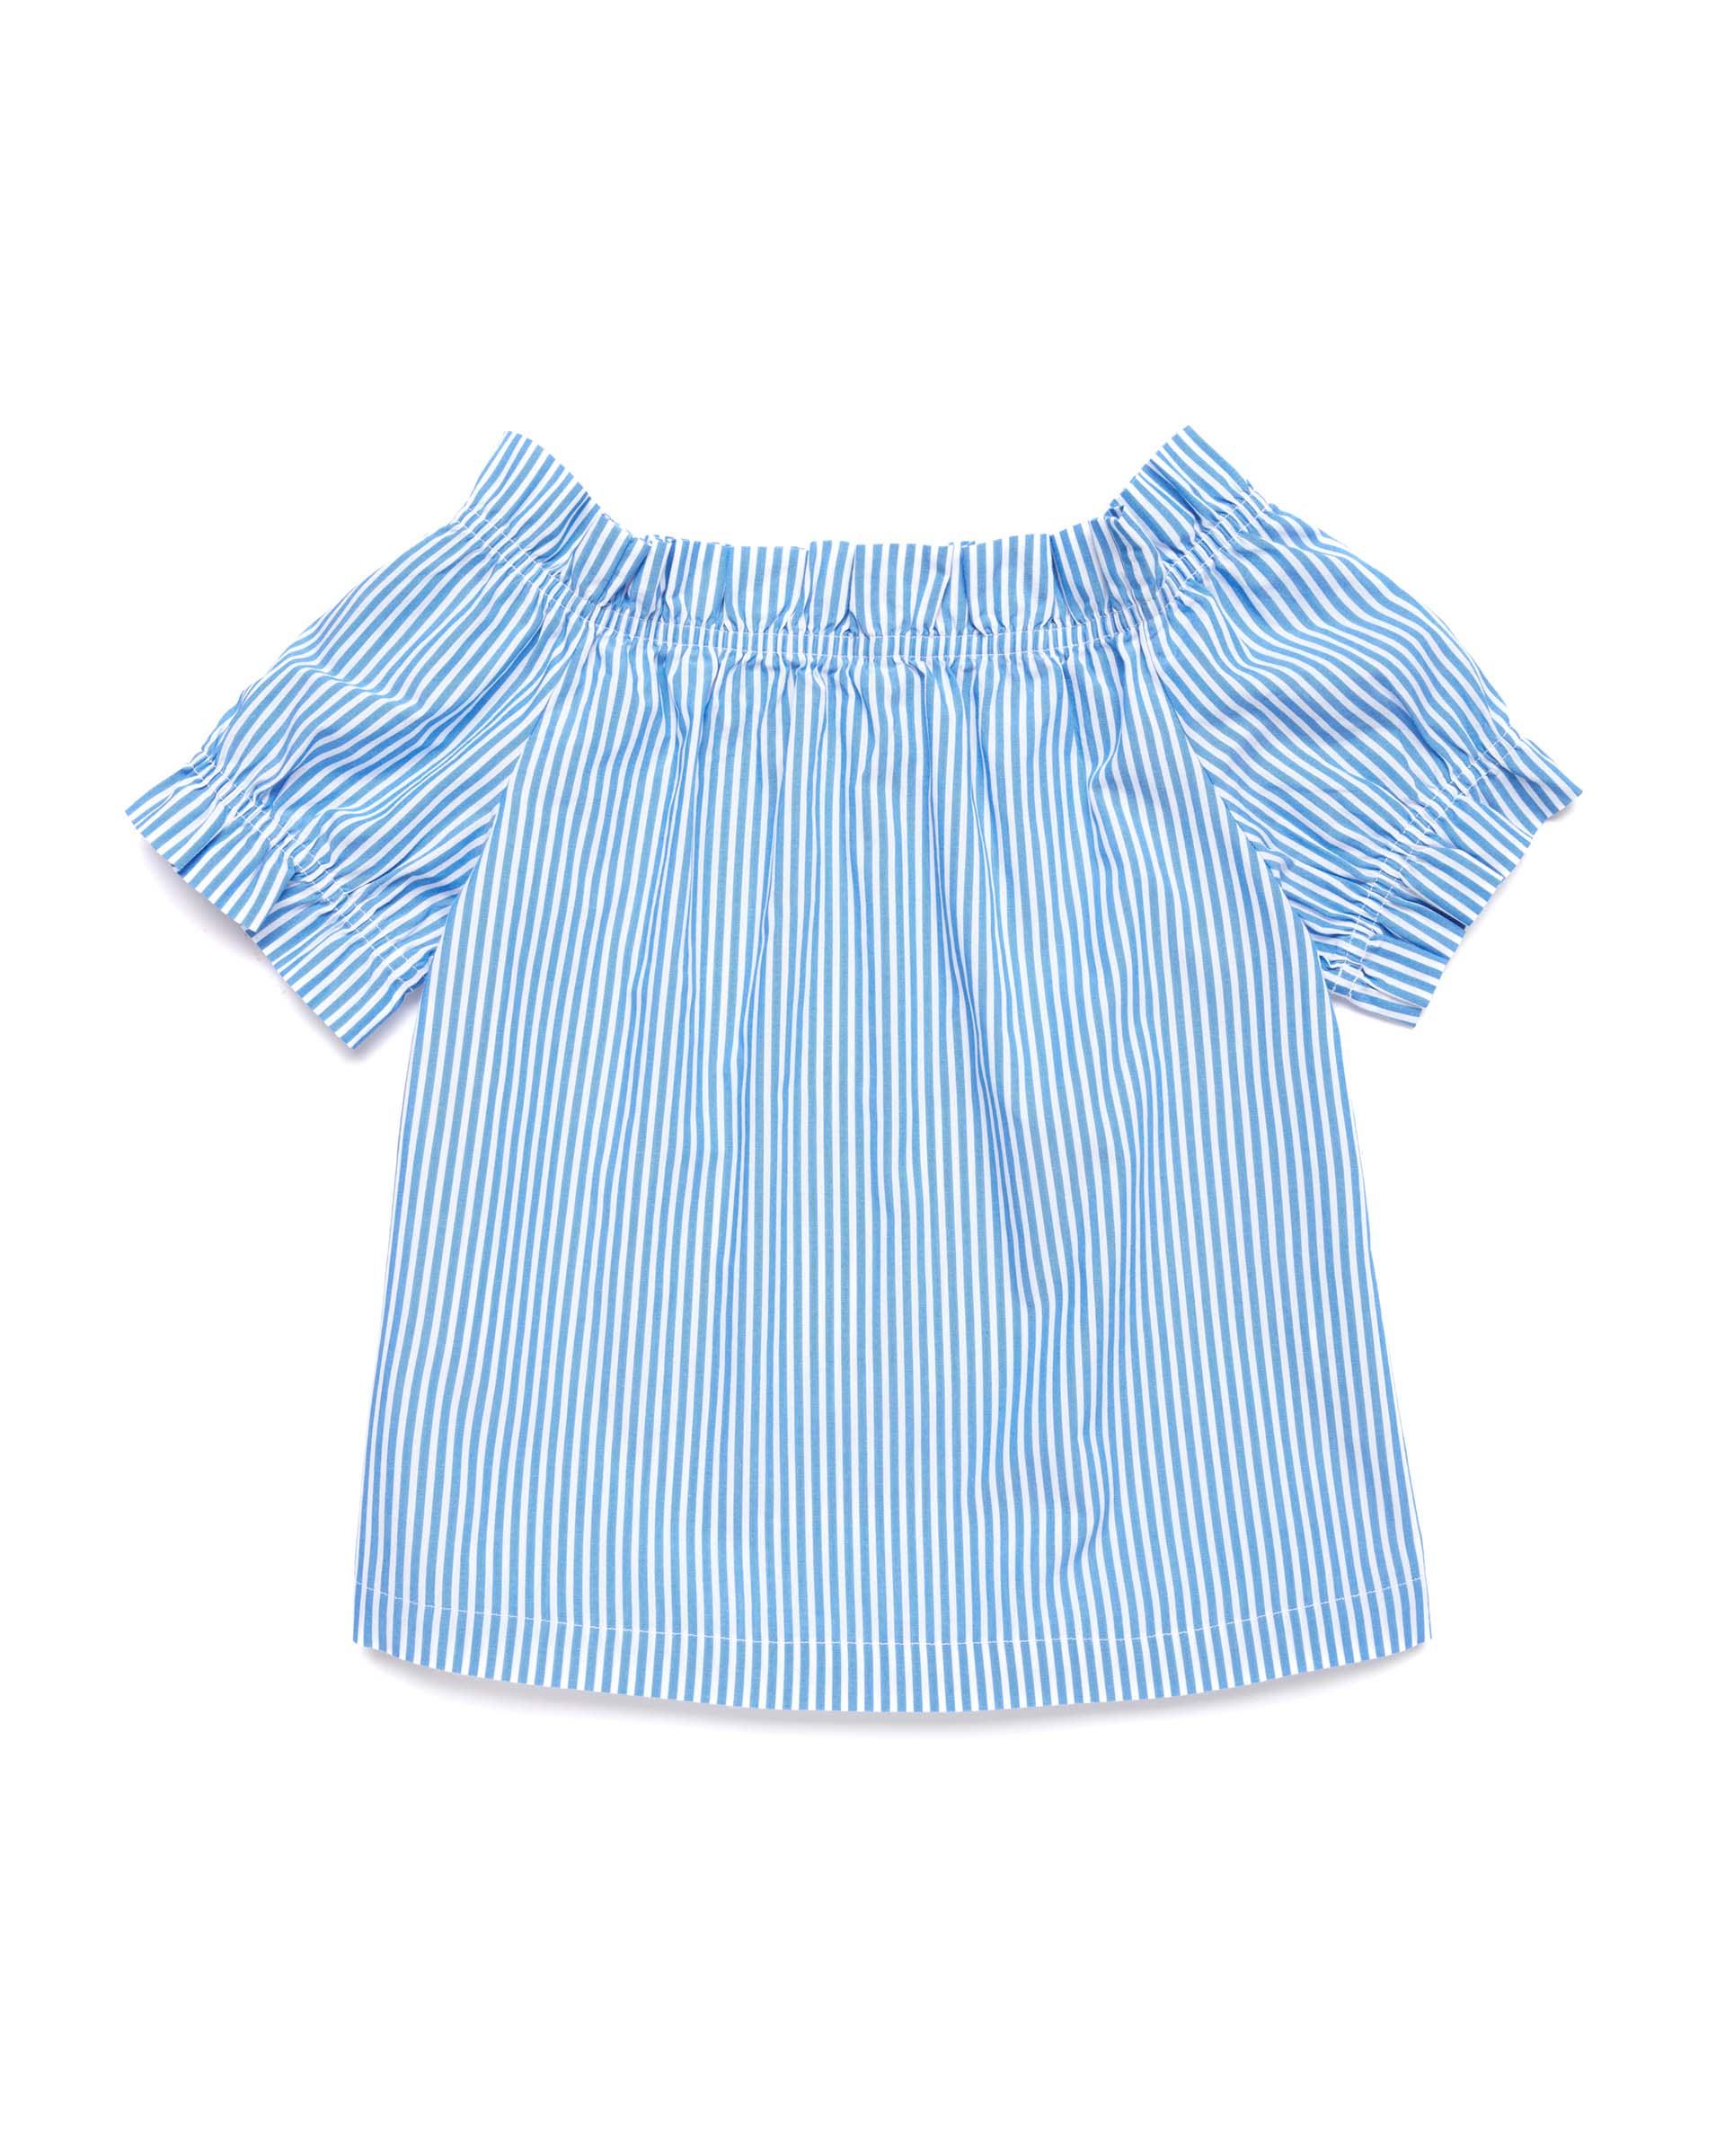 Купить 20P_5OT65QH40_901, Блуза для девочек Benetton 5OT65QH40_901 р-р 128, United Colors of Benetton, Блузки для девочек